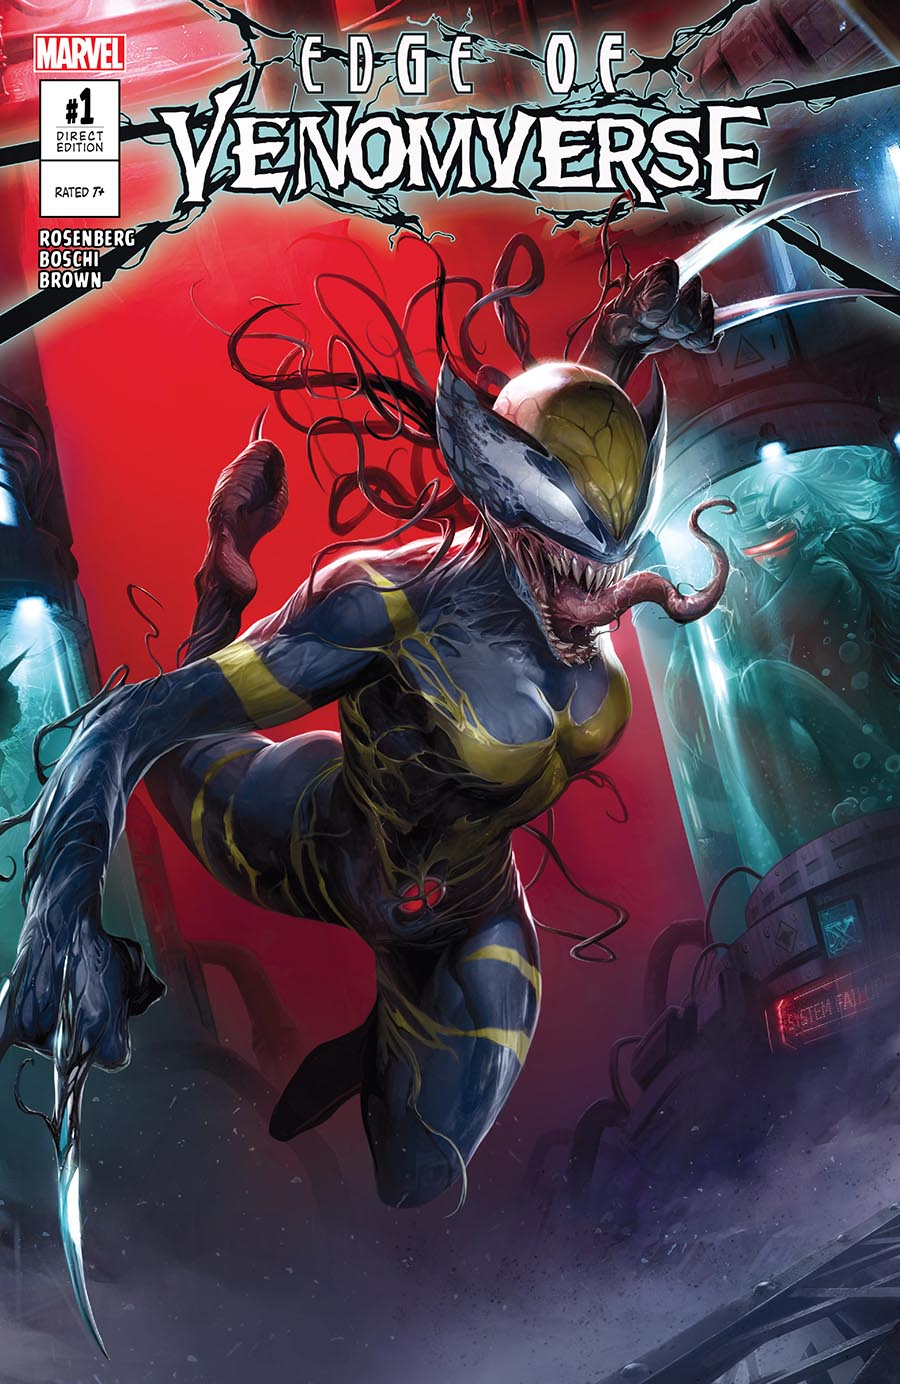 Edge Οf Venomverse